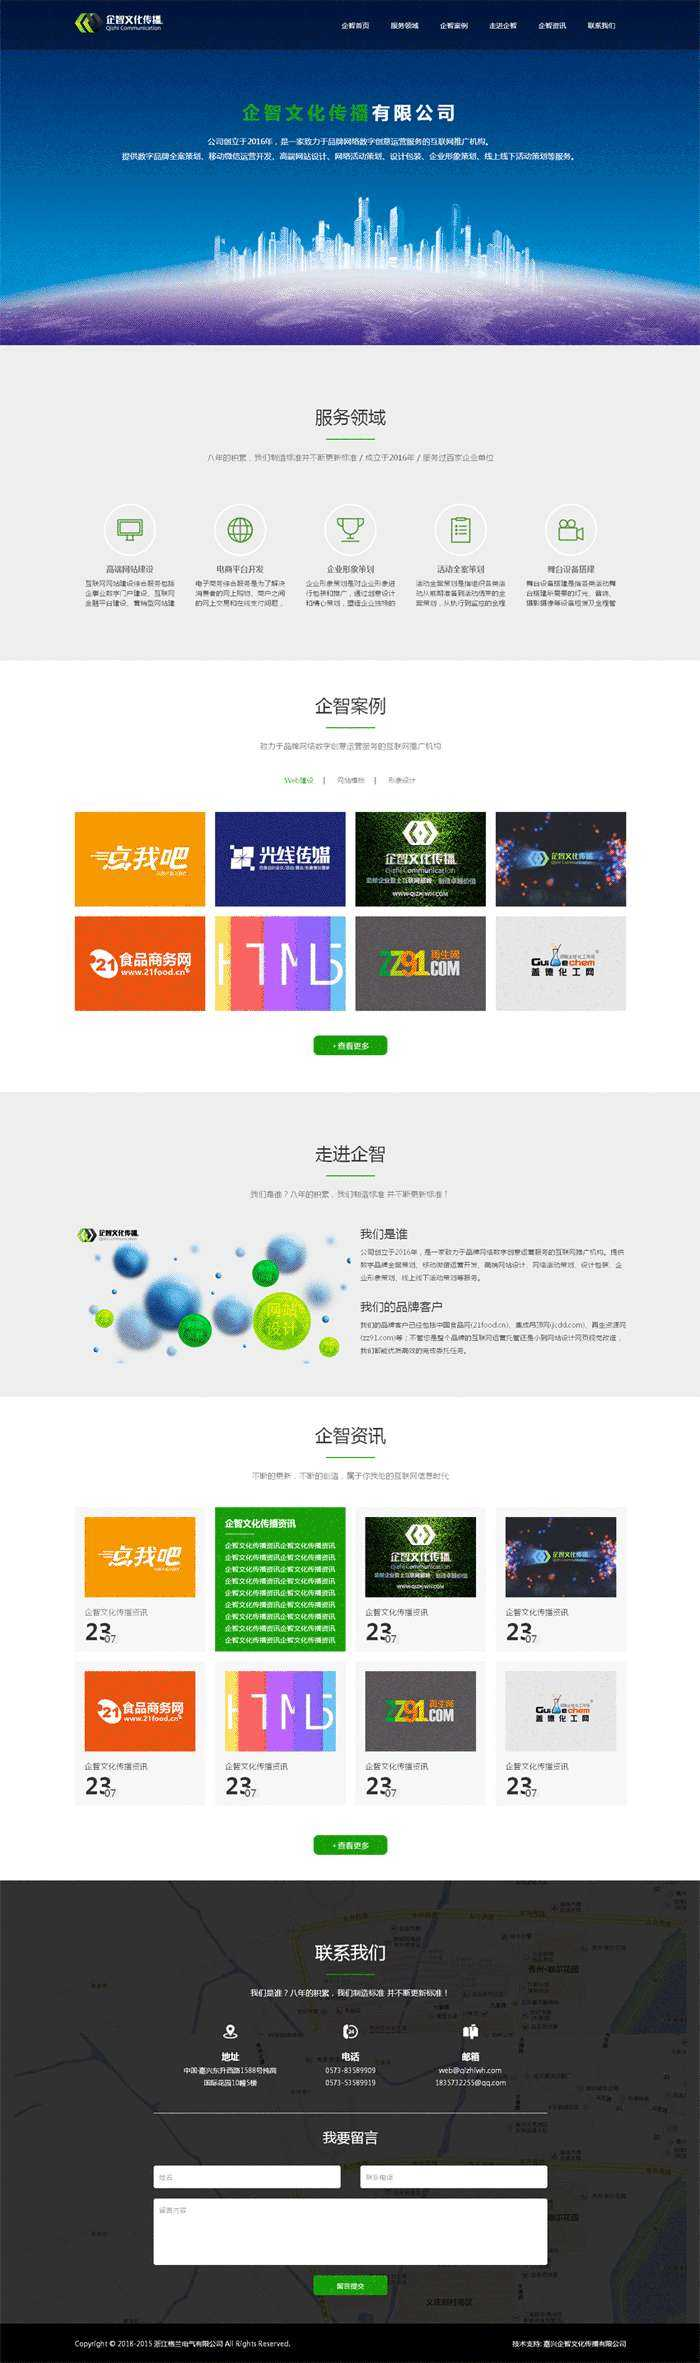 html5大气的企业文化传播公司网站模板源码